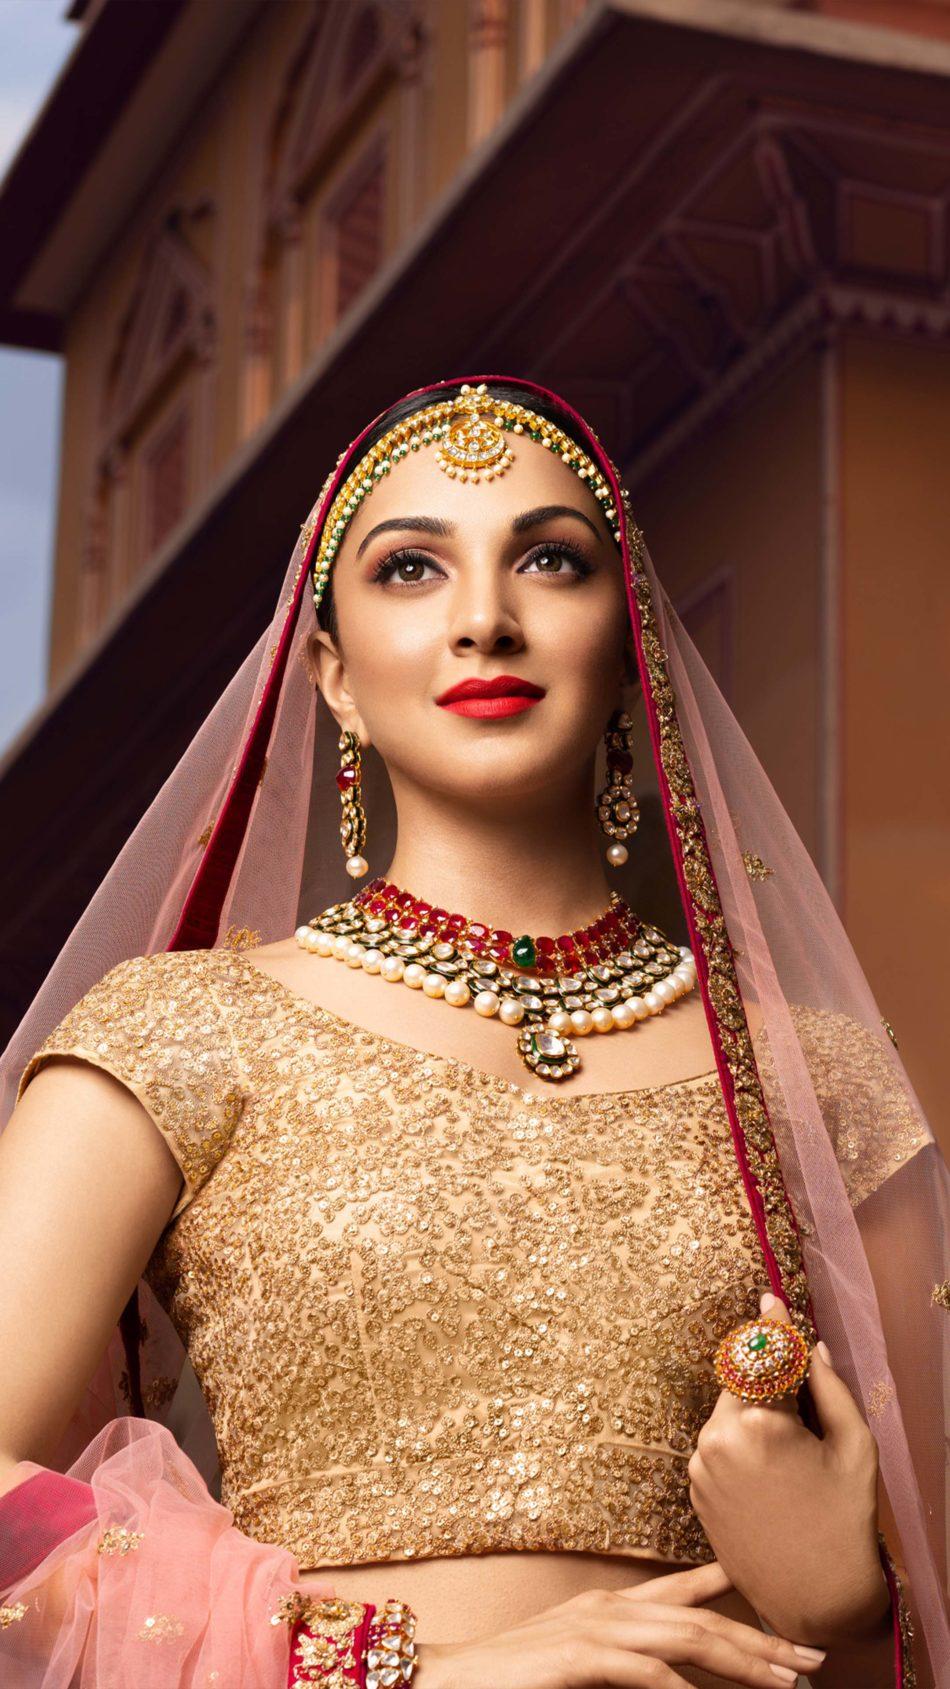 Kiara Advani In Traditional Dress 4K Ultra HD Mobile Wallpaper